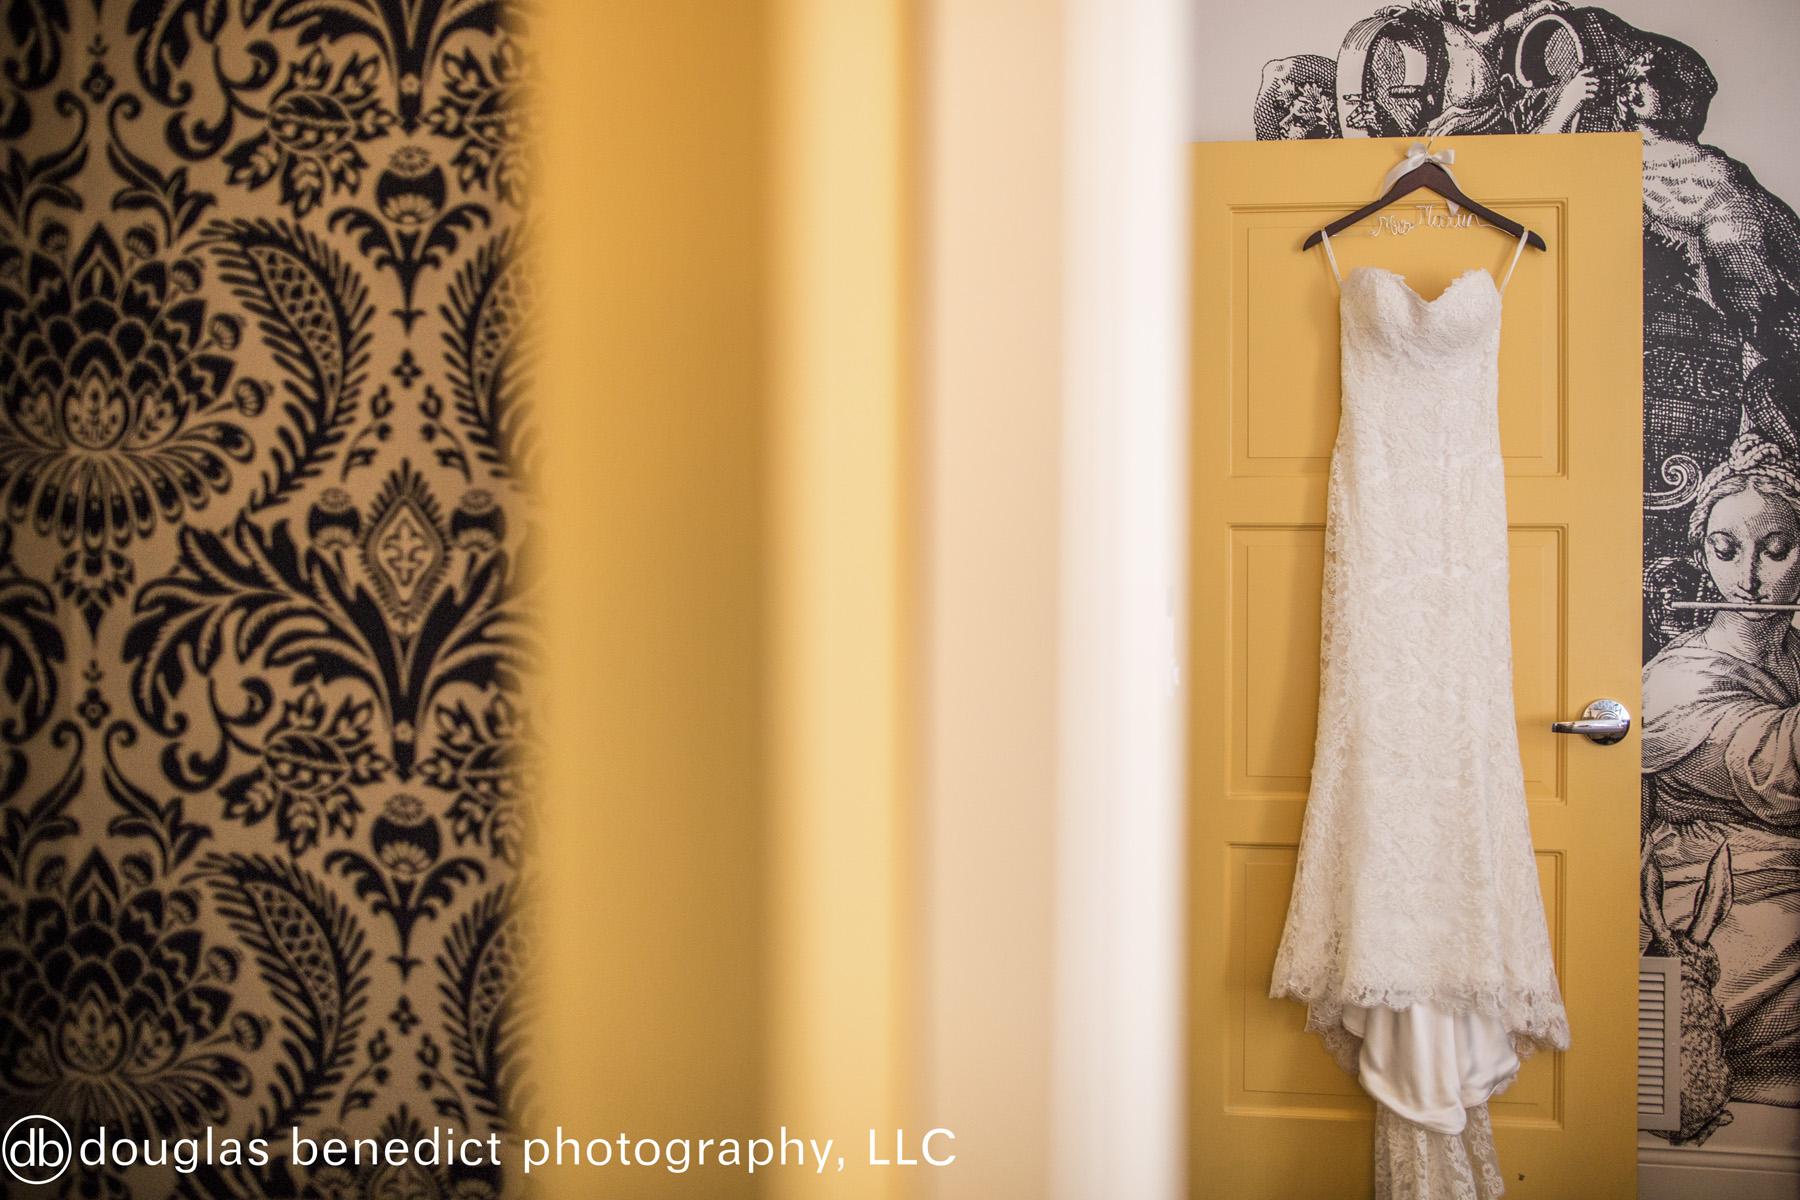 01 Philadelphia Wedding Hotel Monaco Anna Maier Dress.jpg